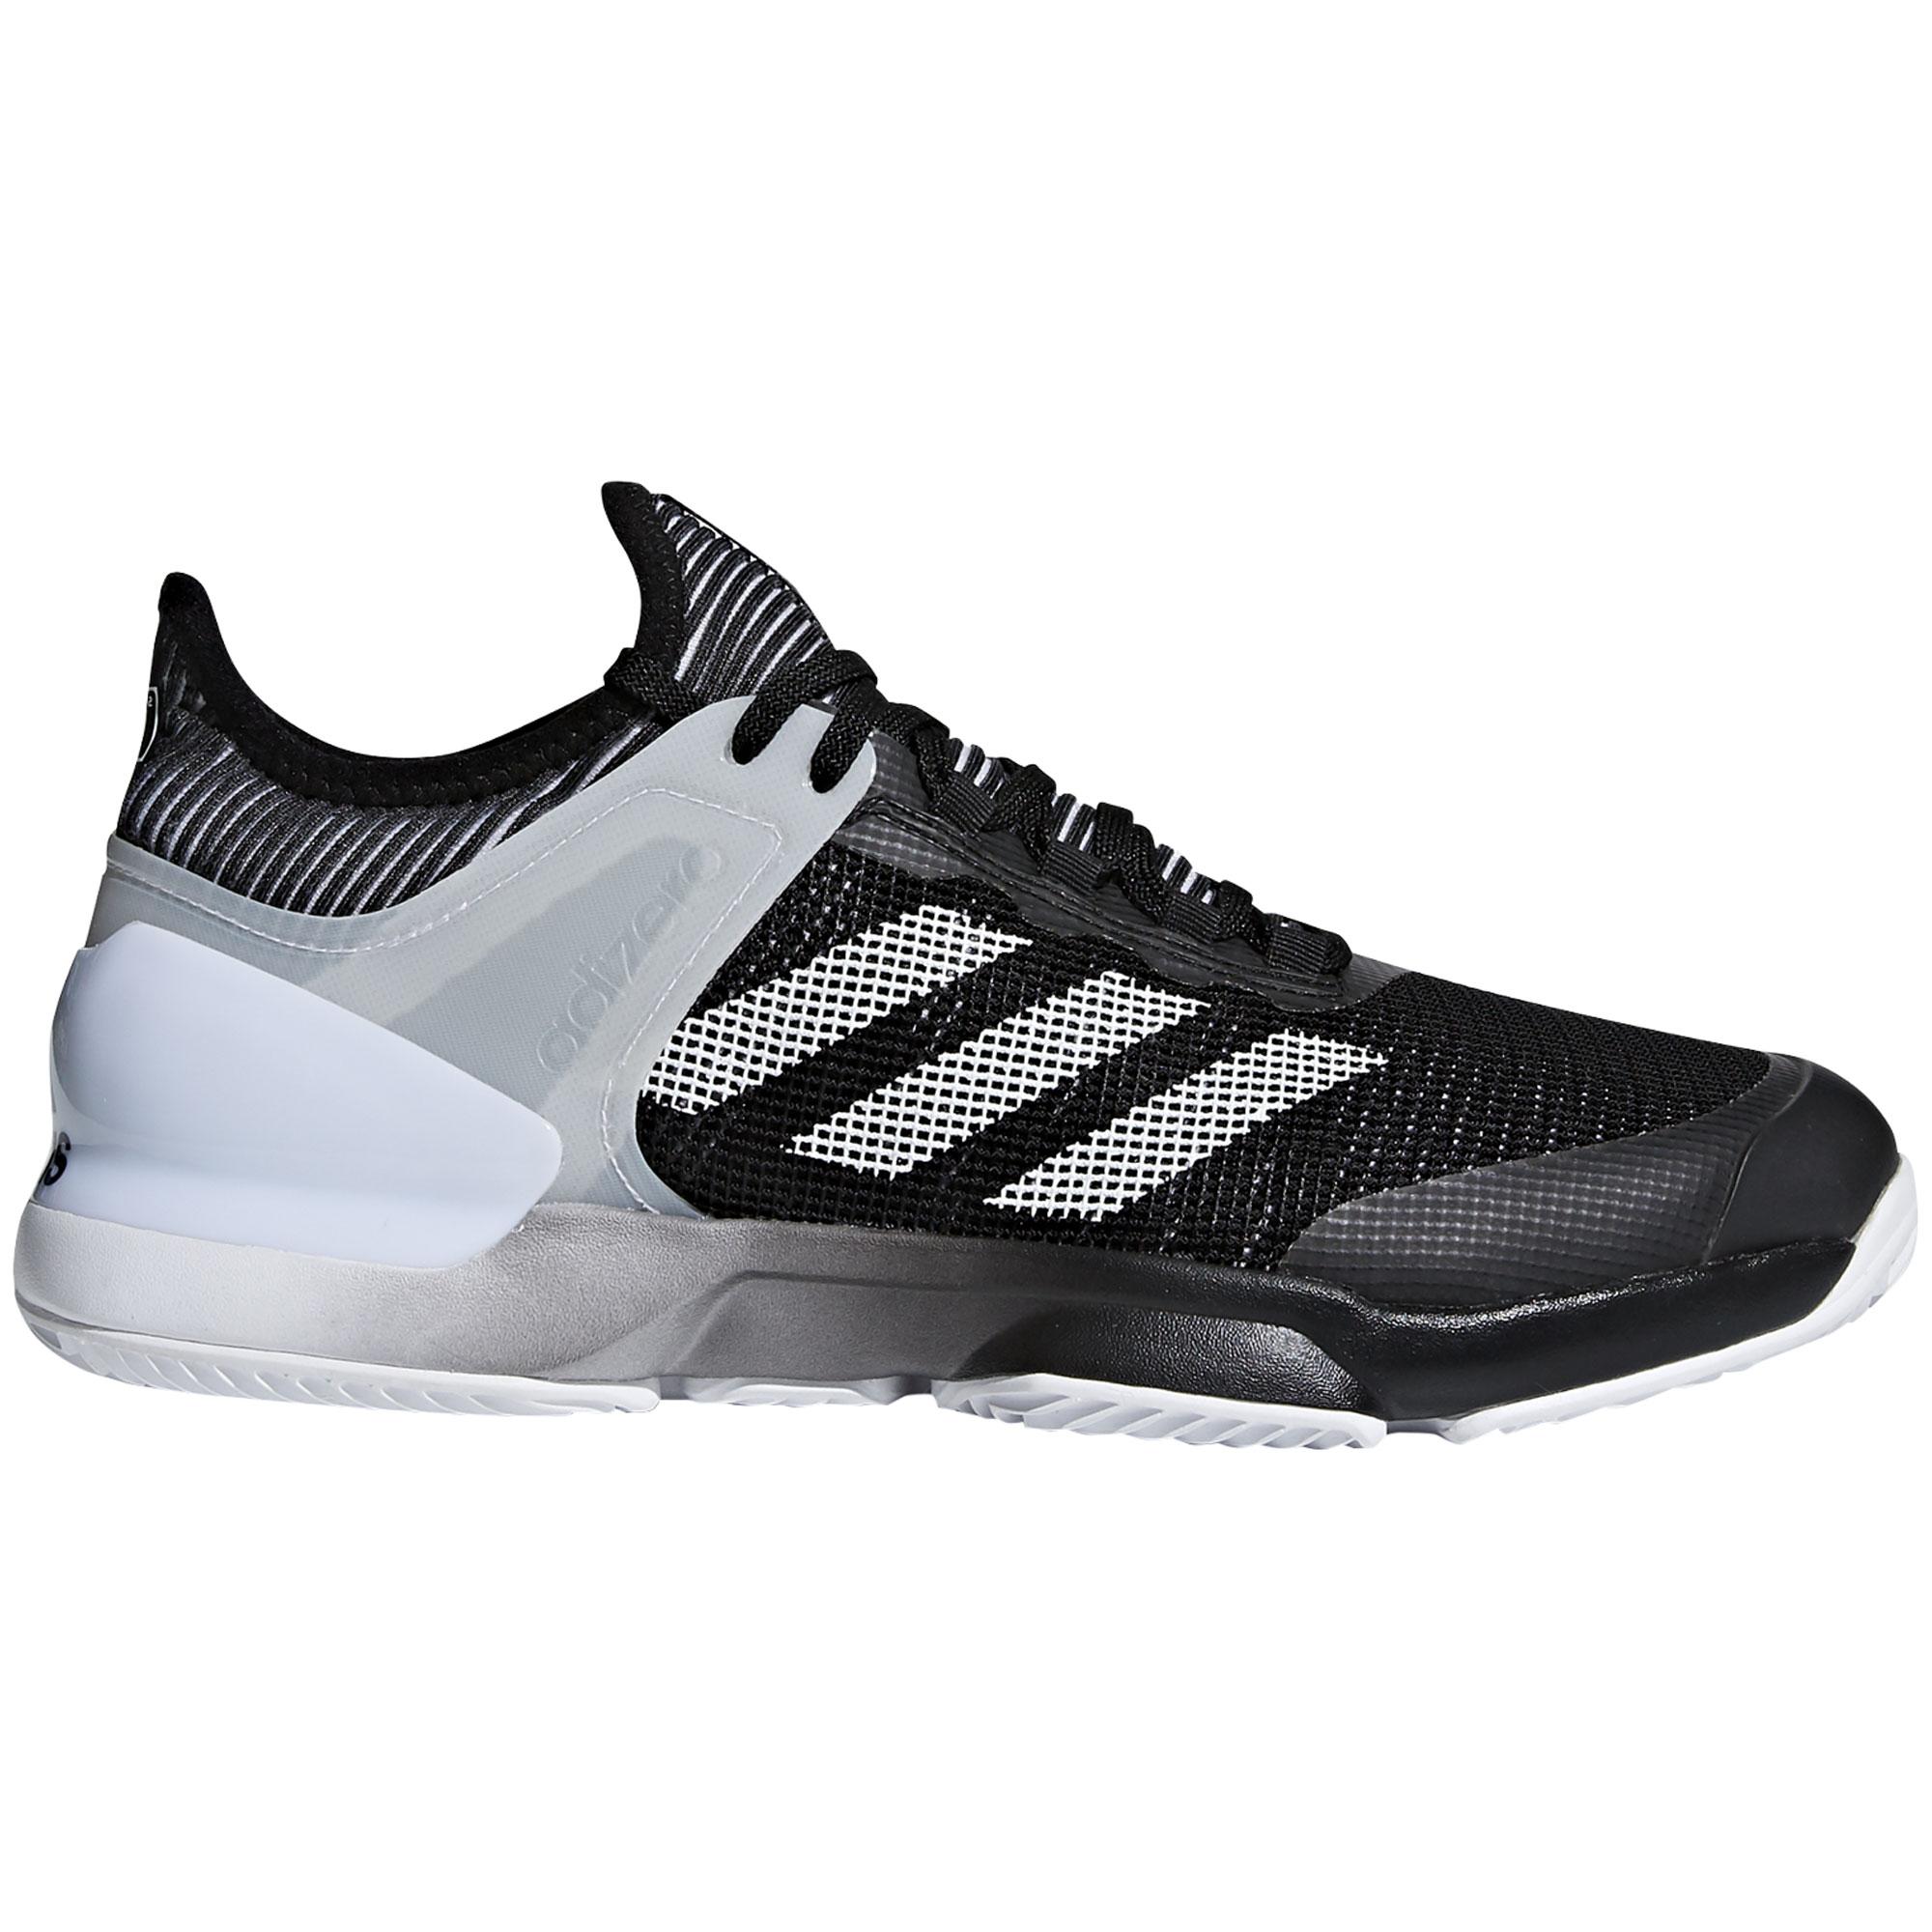 Afbeelding van Adidas Adizero Ubersonic 2.0 Clay CM7746 Tennisschoenen Heren Core Black White